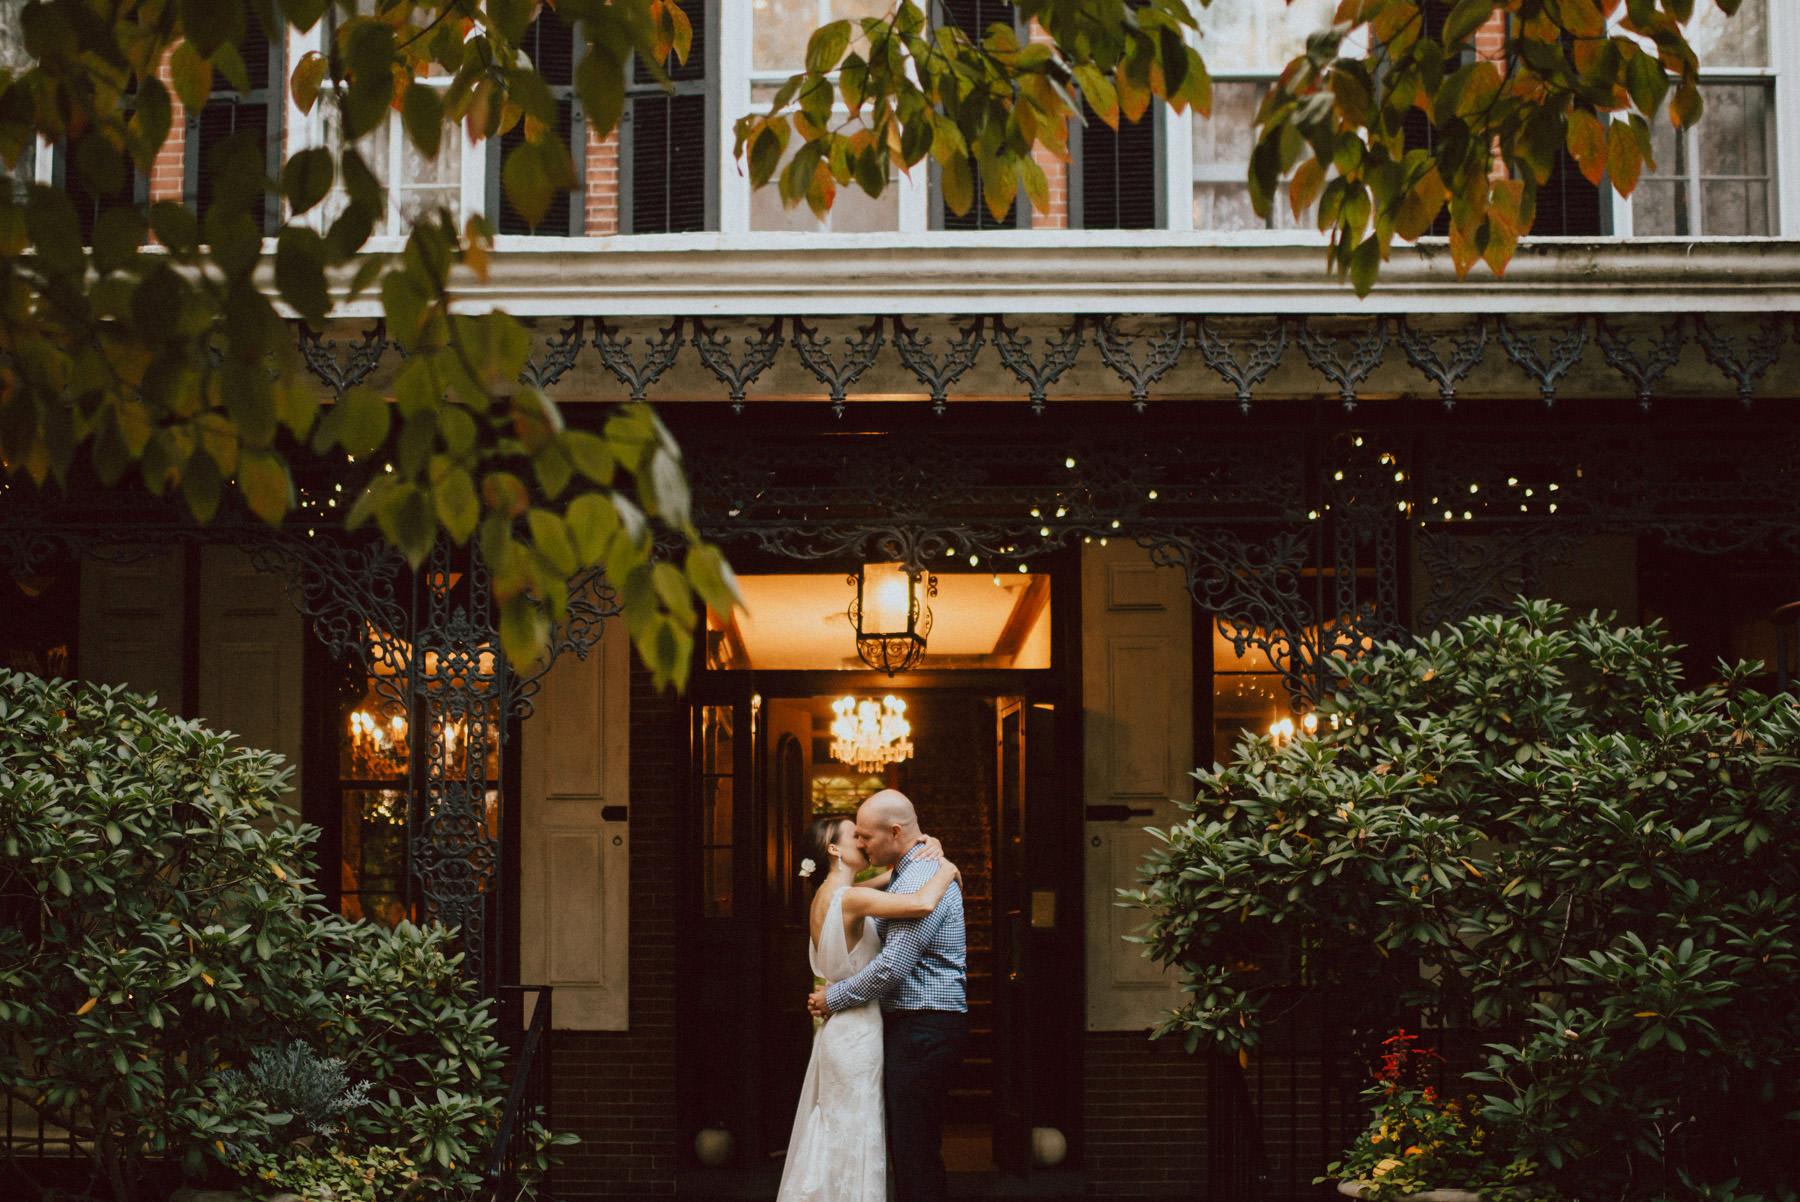 242-faunbrook-bed-and-breakfast-wedding-7.jpg